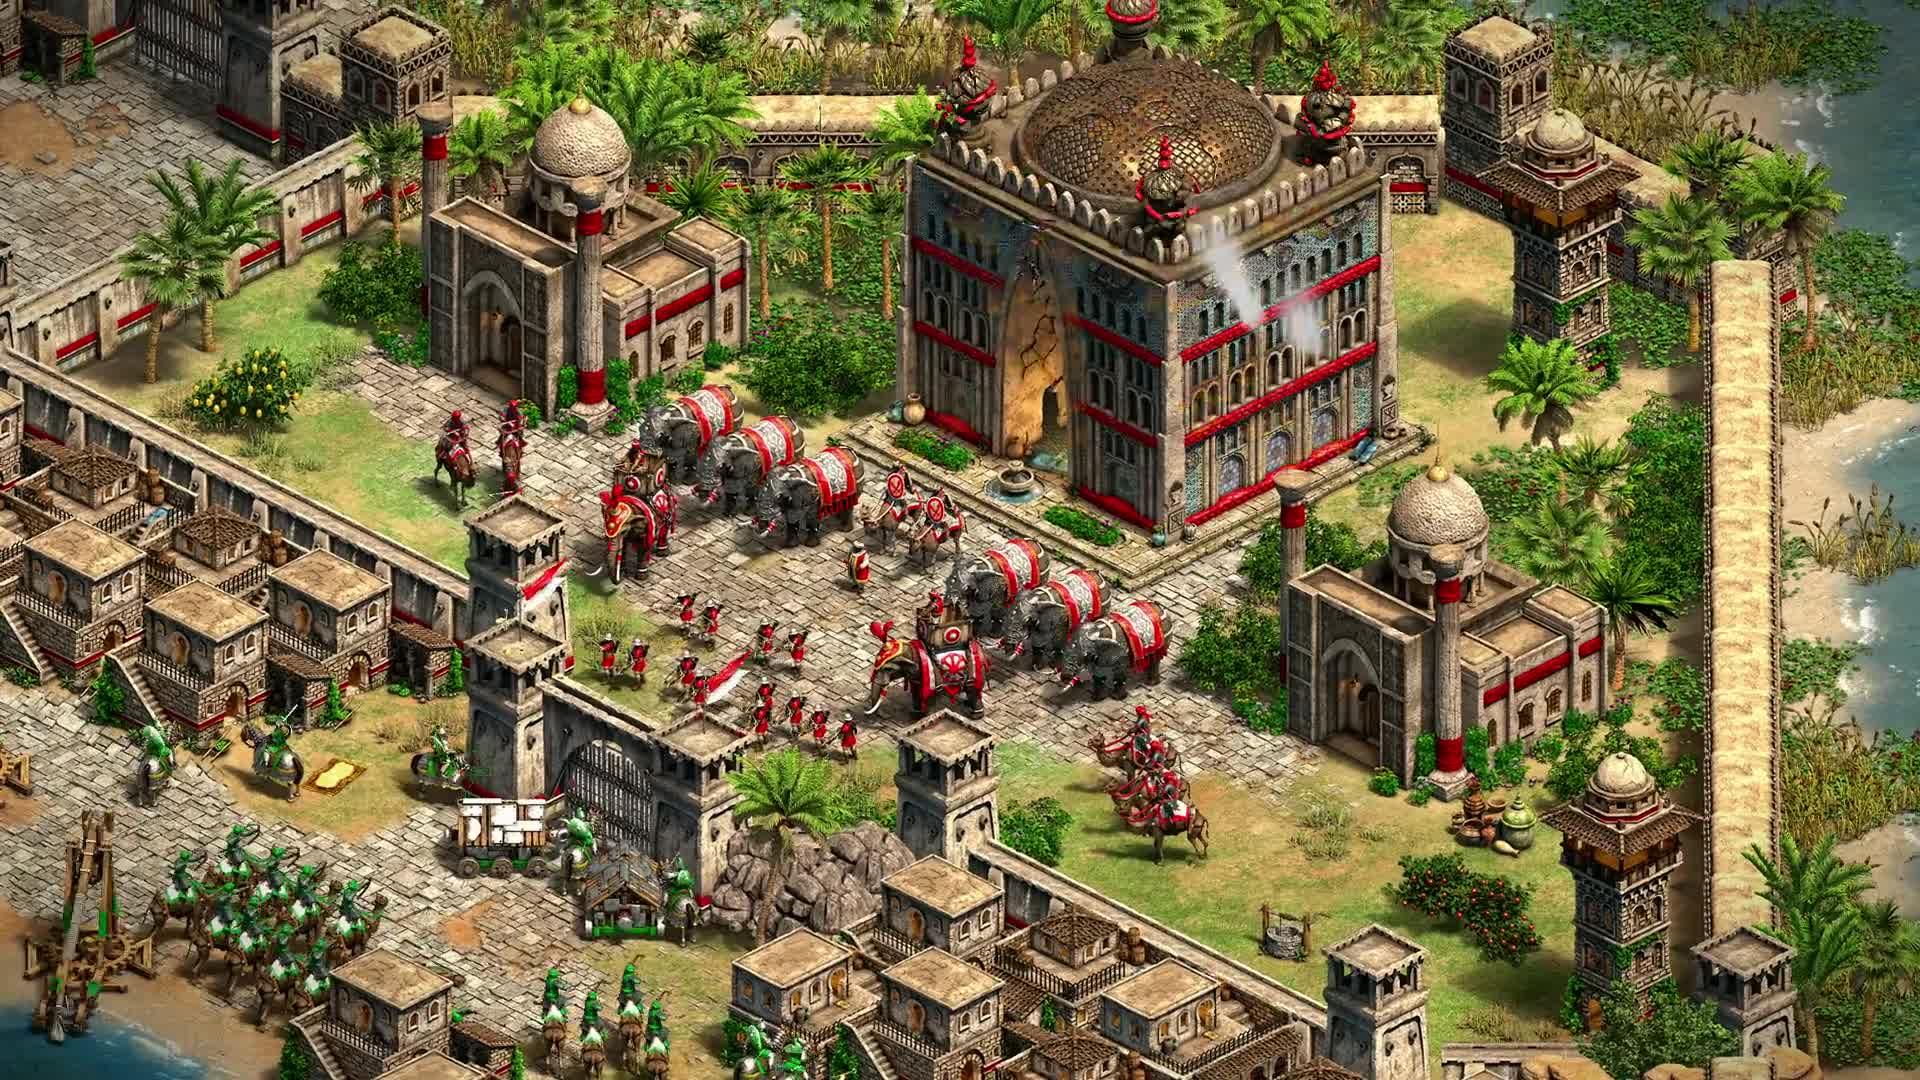 Microsoft, Trailer, Strategiespiel, Age of Empires, X019, Age of Empires 2, Age of Empires 2 Definitive Edition